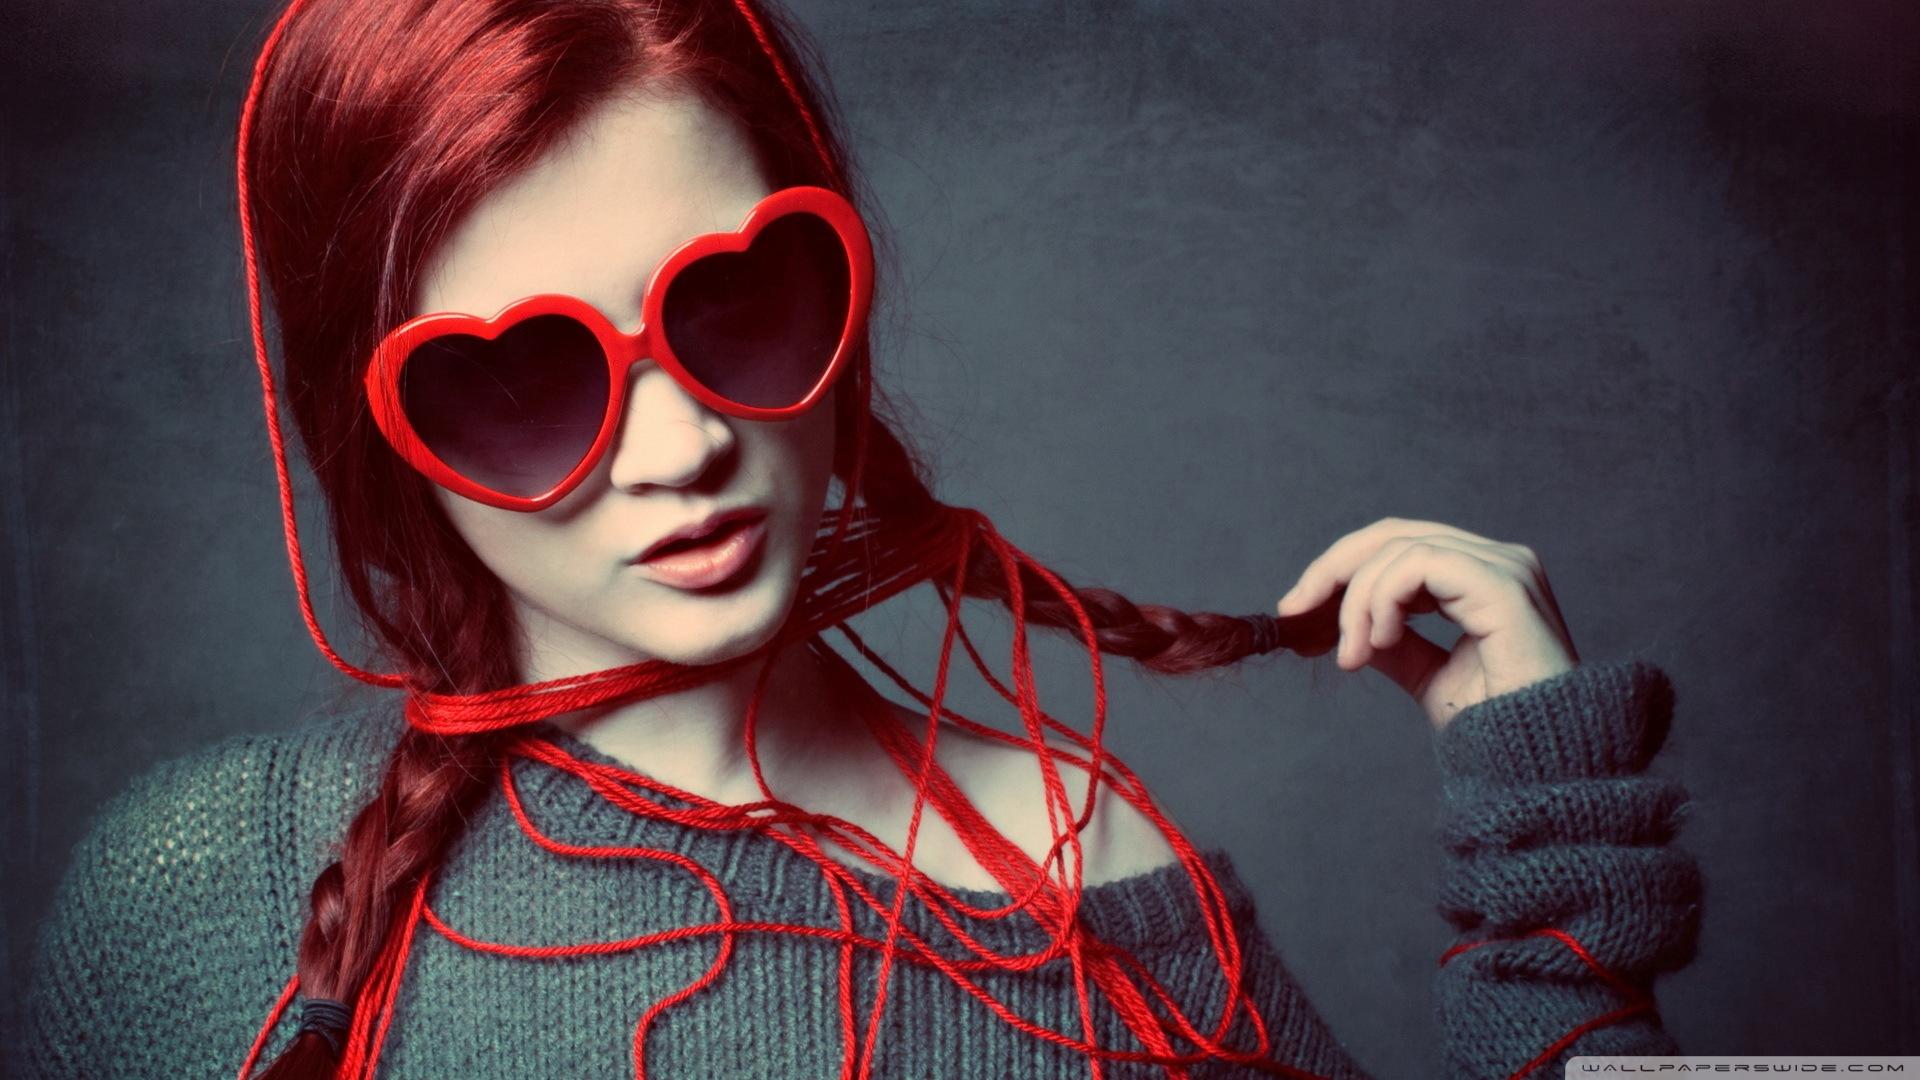 Beautiful Girl Totally In Love 4k Uhd Wallpaper - 4k Wallpaper Girls , HD Wallpaper & Backgrounds